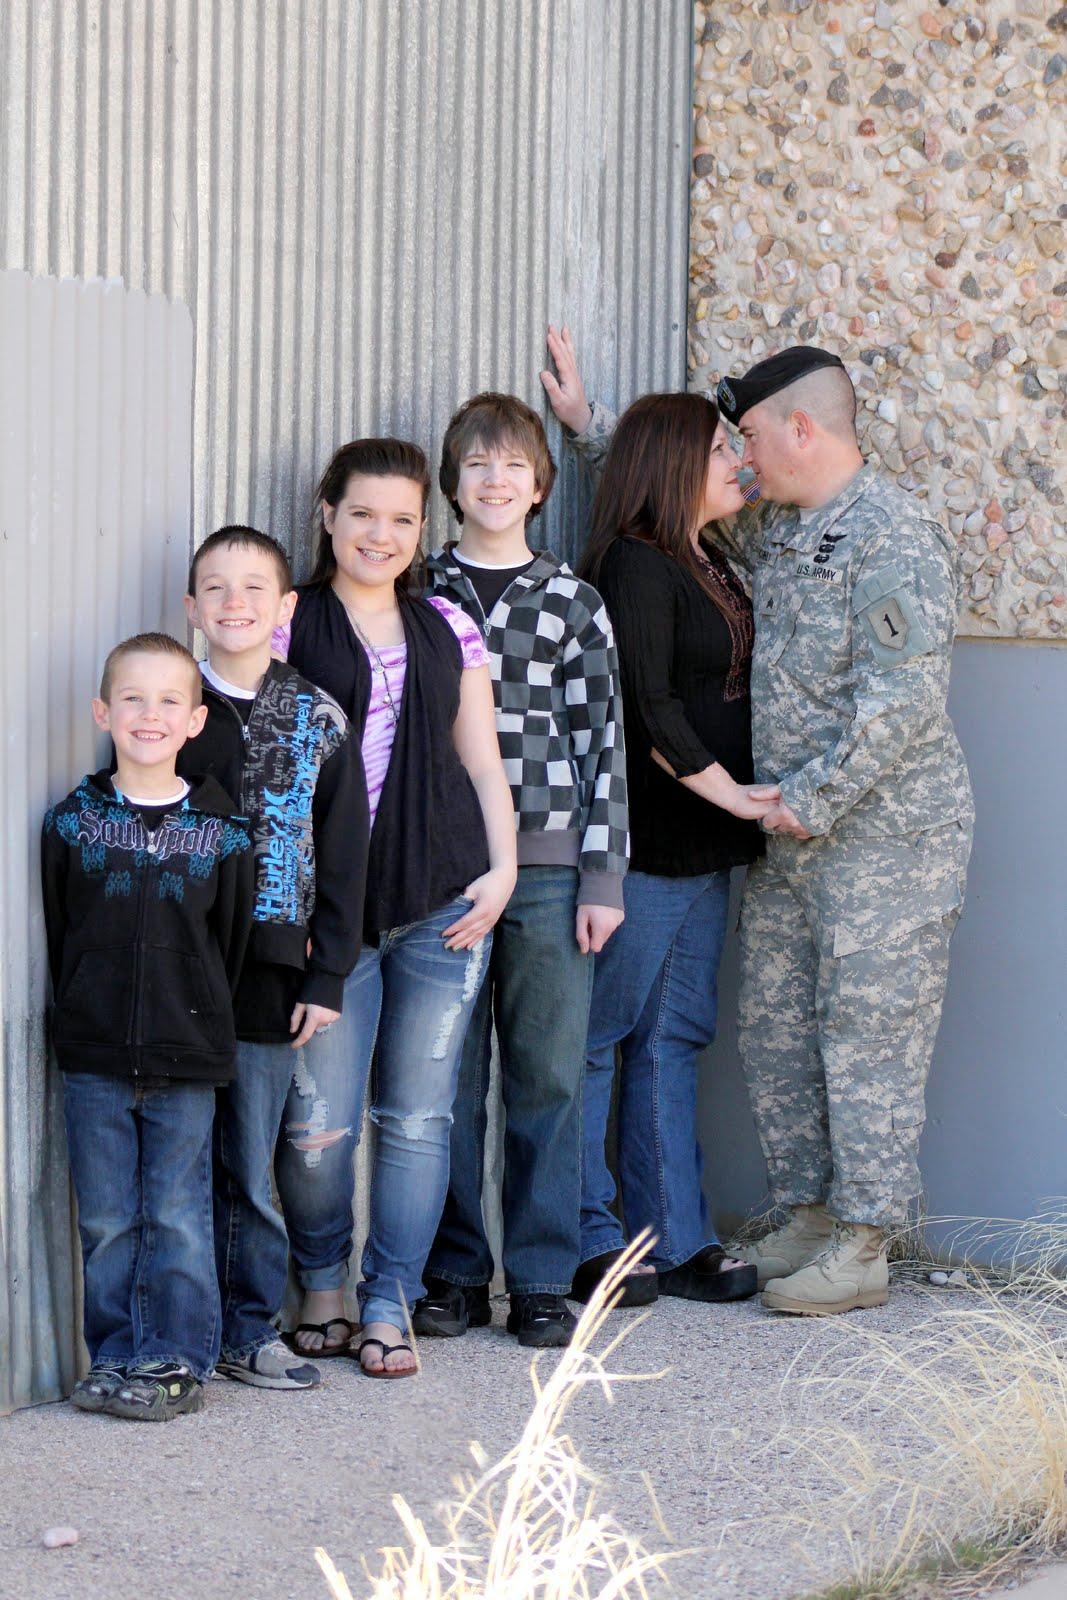 The McKinney Family